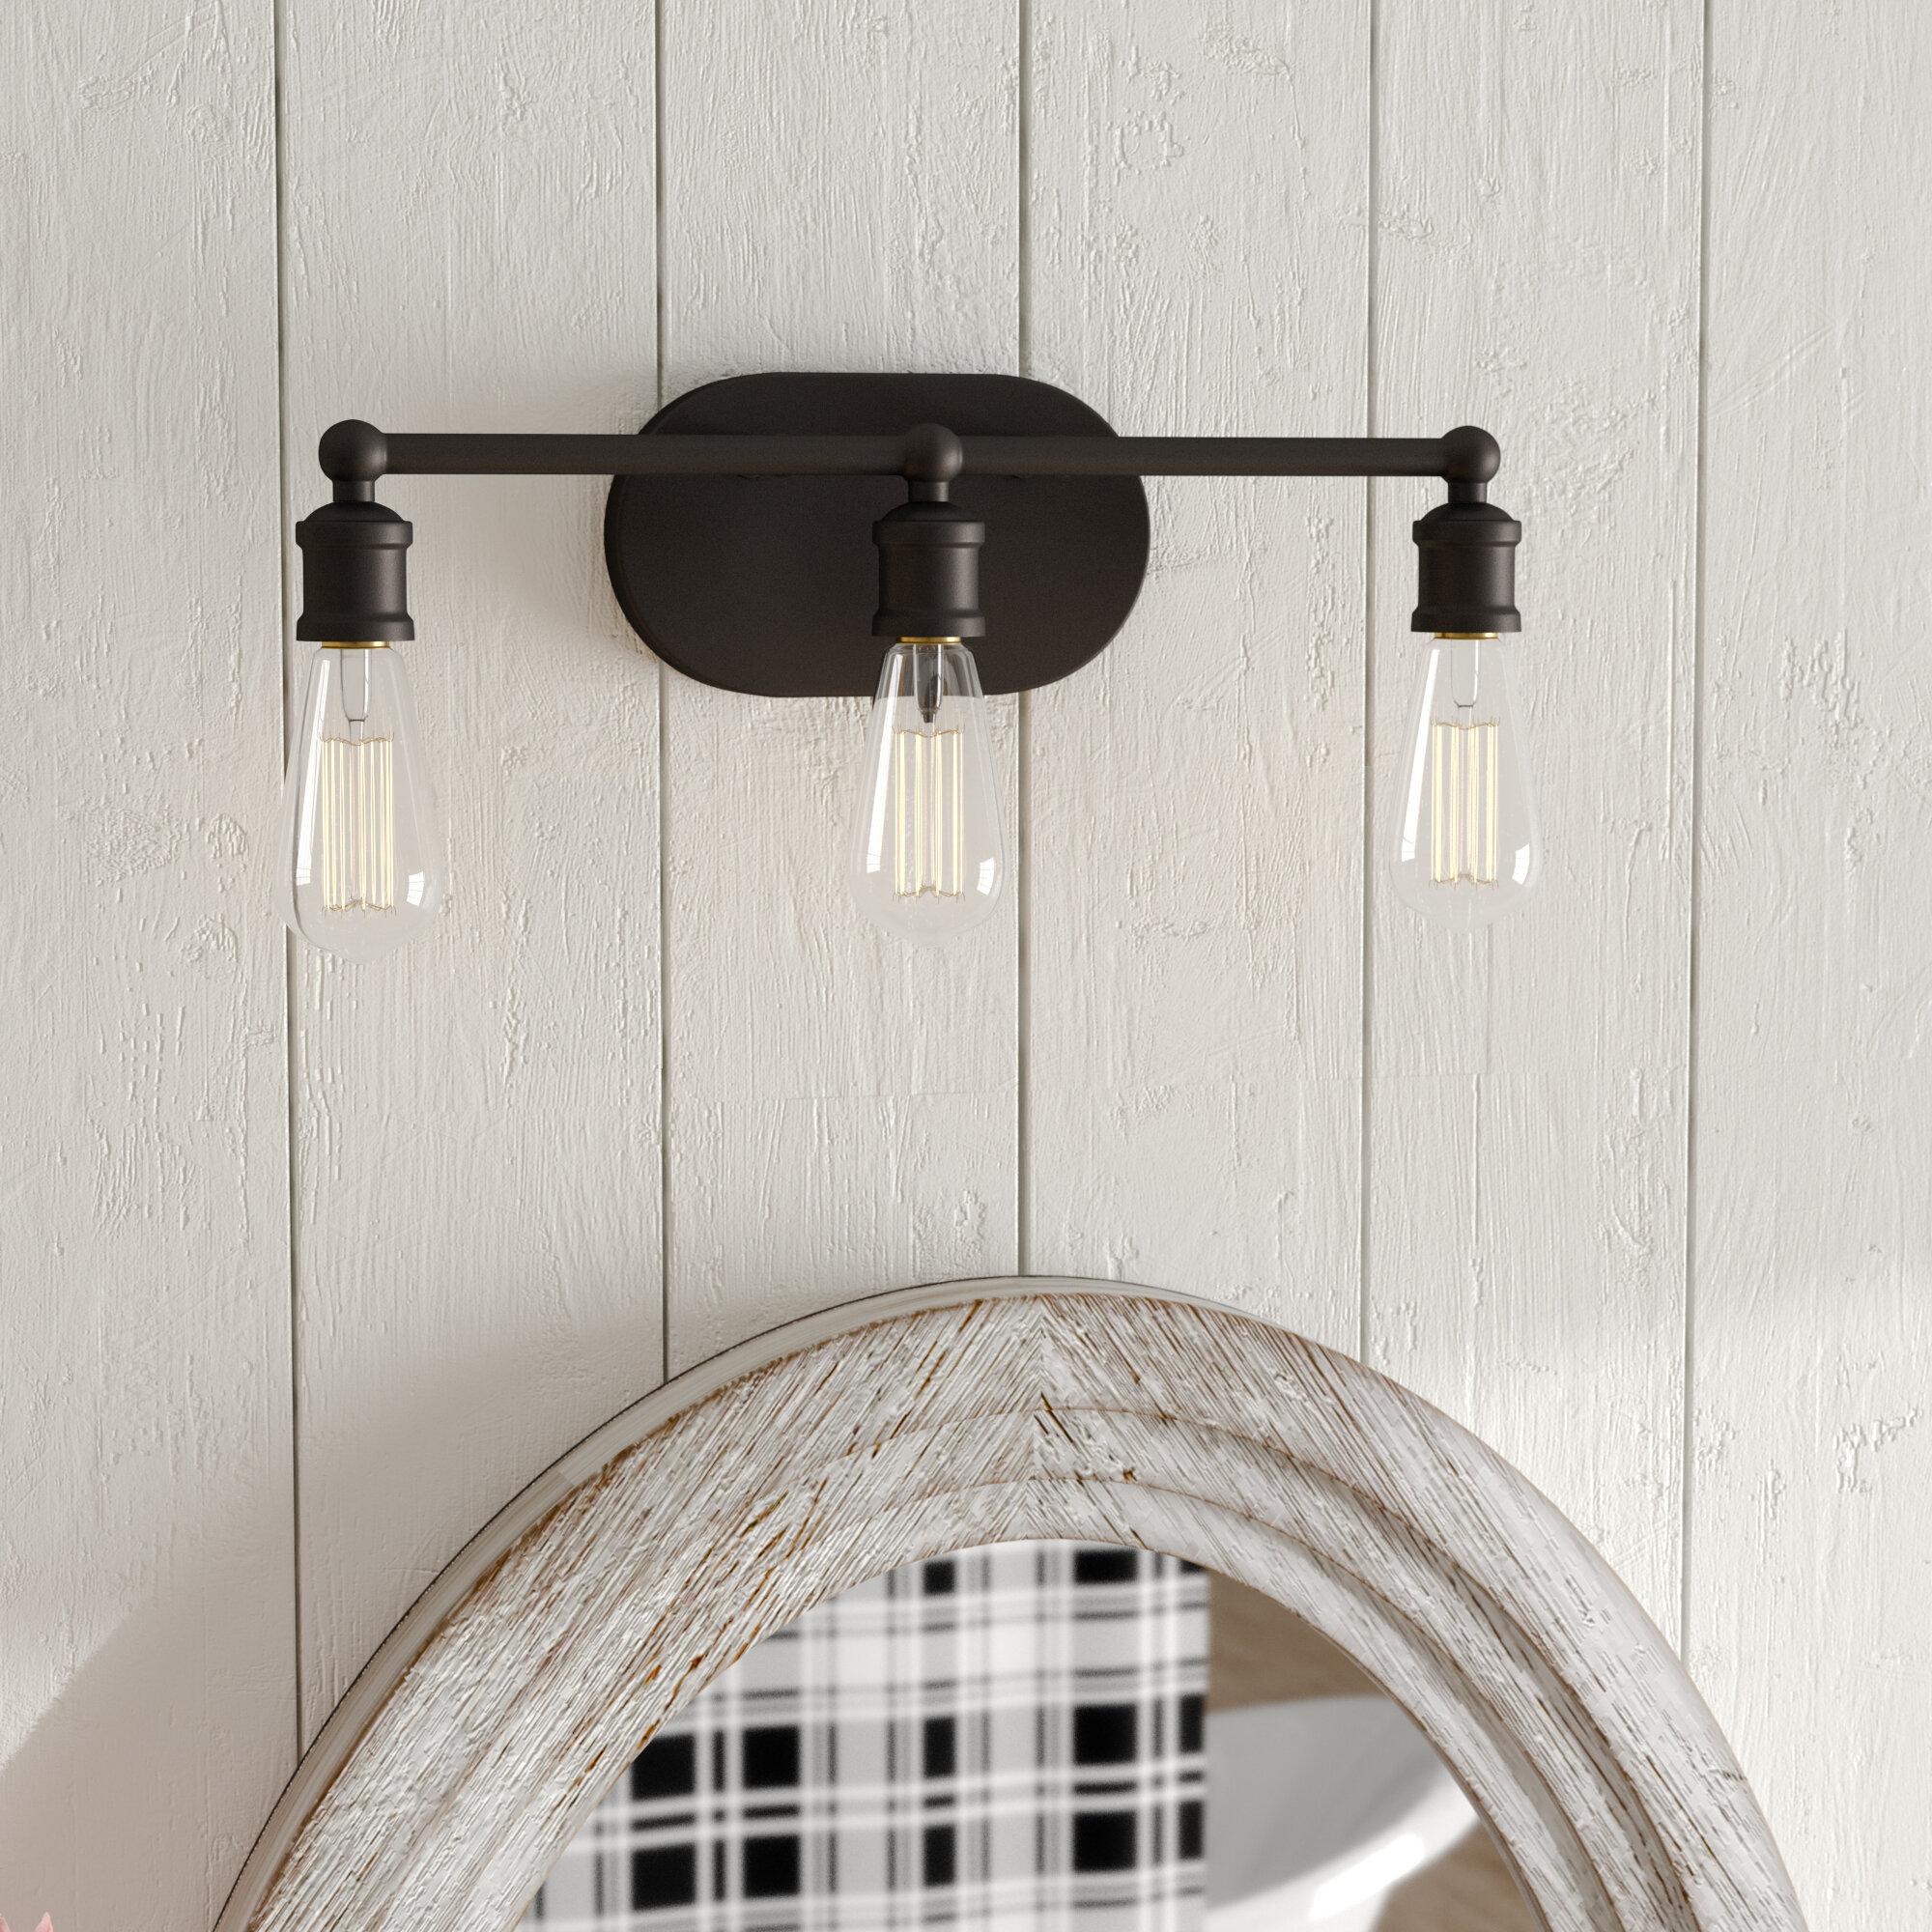 Laurel foundry modern farmhouse agave 3 light vanity light fixture reviews wayfair